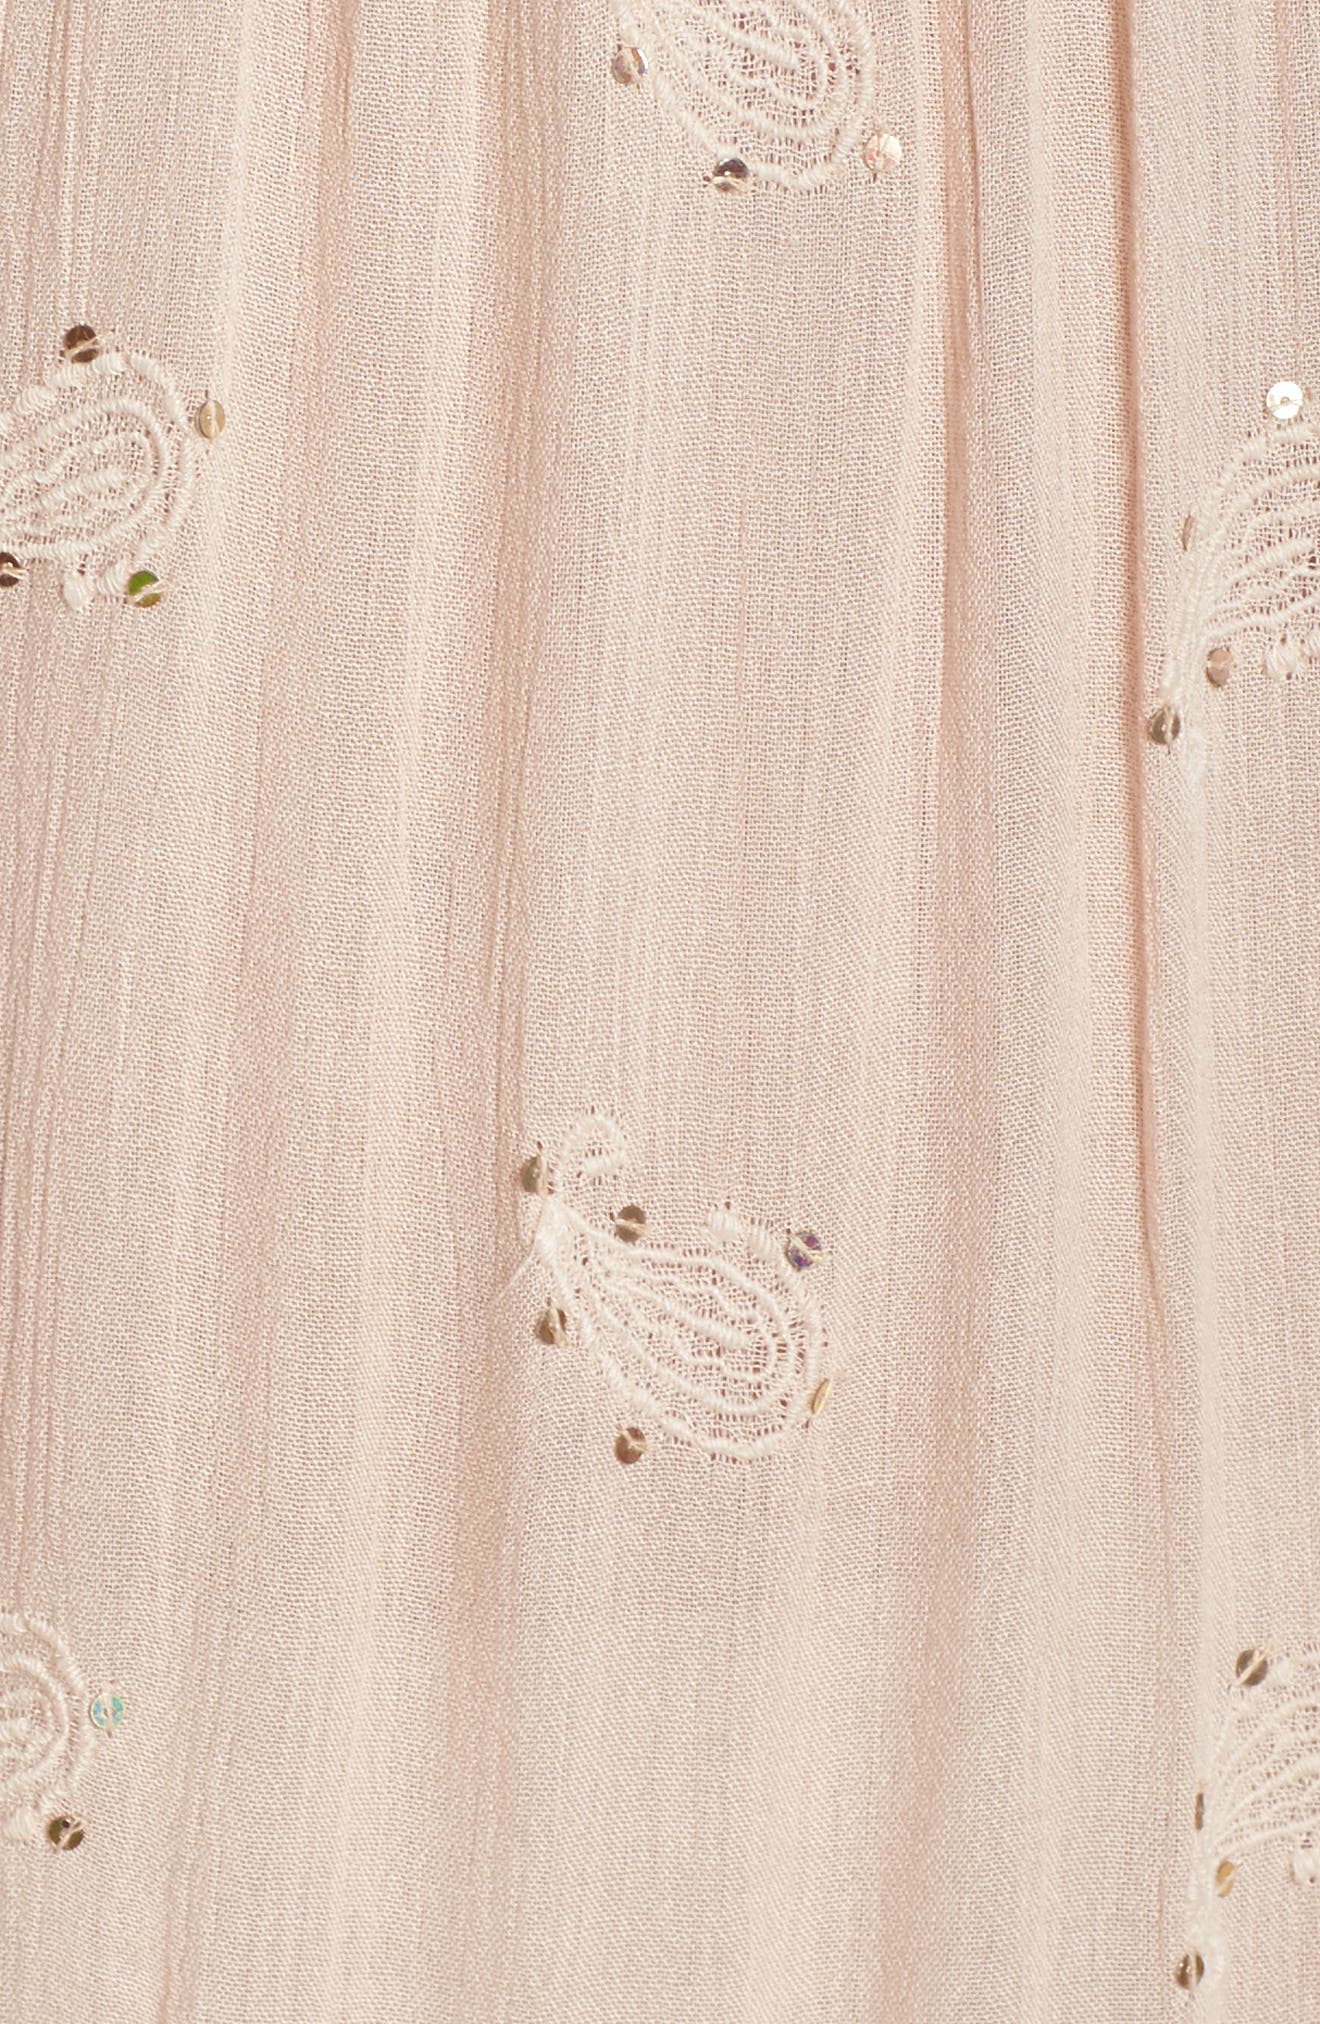 Mercer Cover-Up Maxi Dress,                             Alternate thumbnail 5, color,                             Blush